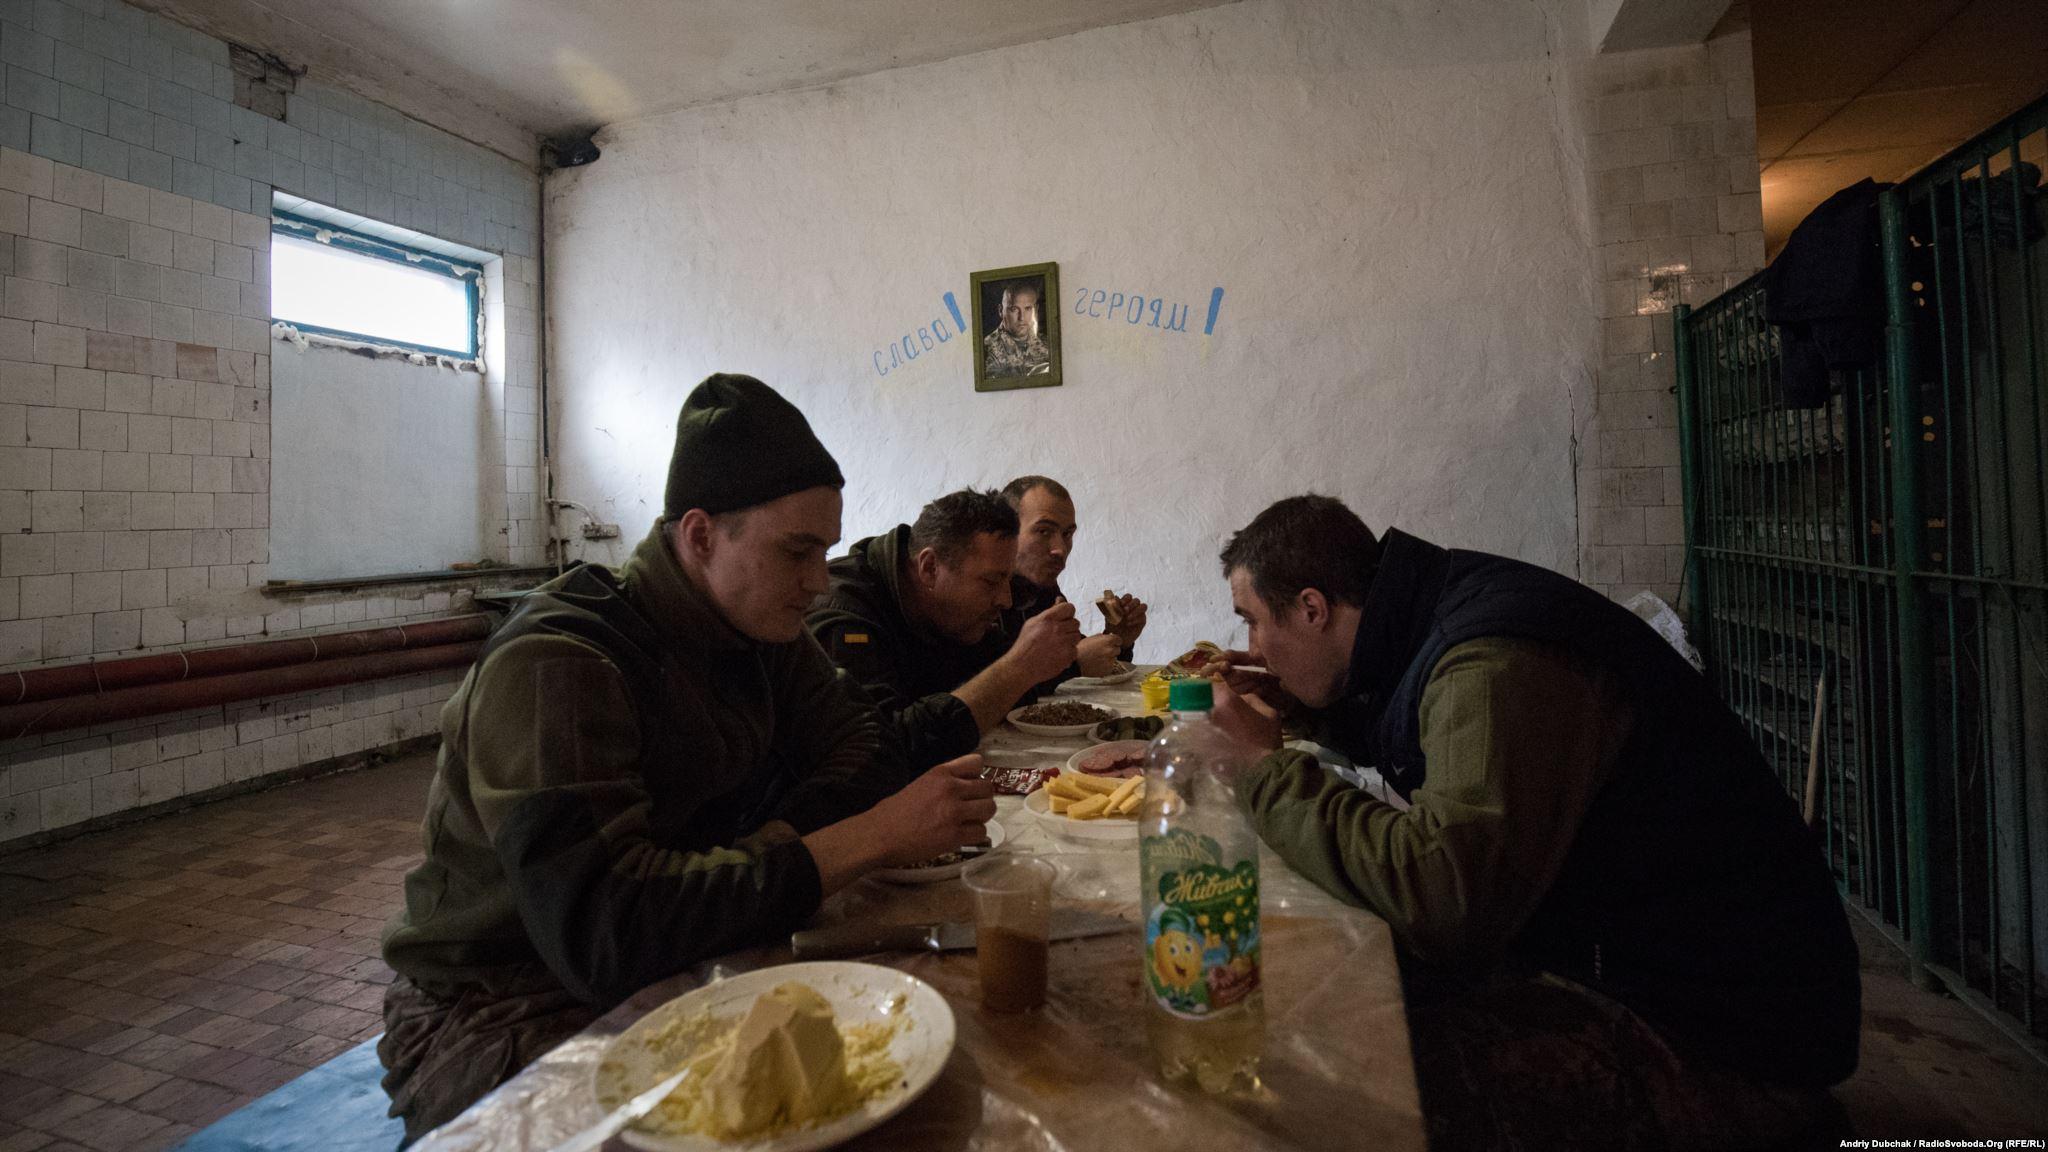 (photo by ukrainian military photographer Andriy Dubchak)